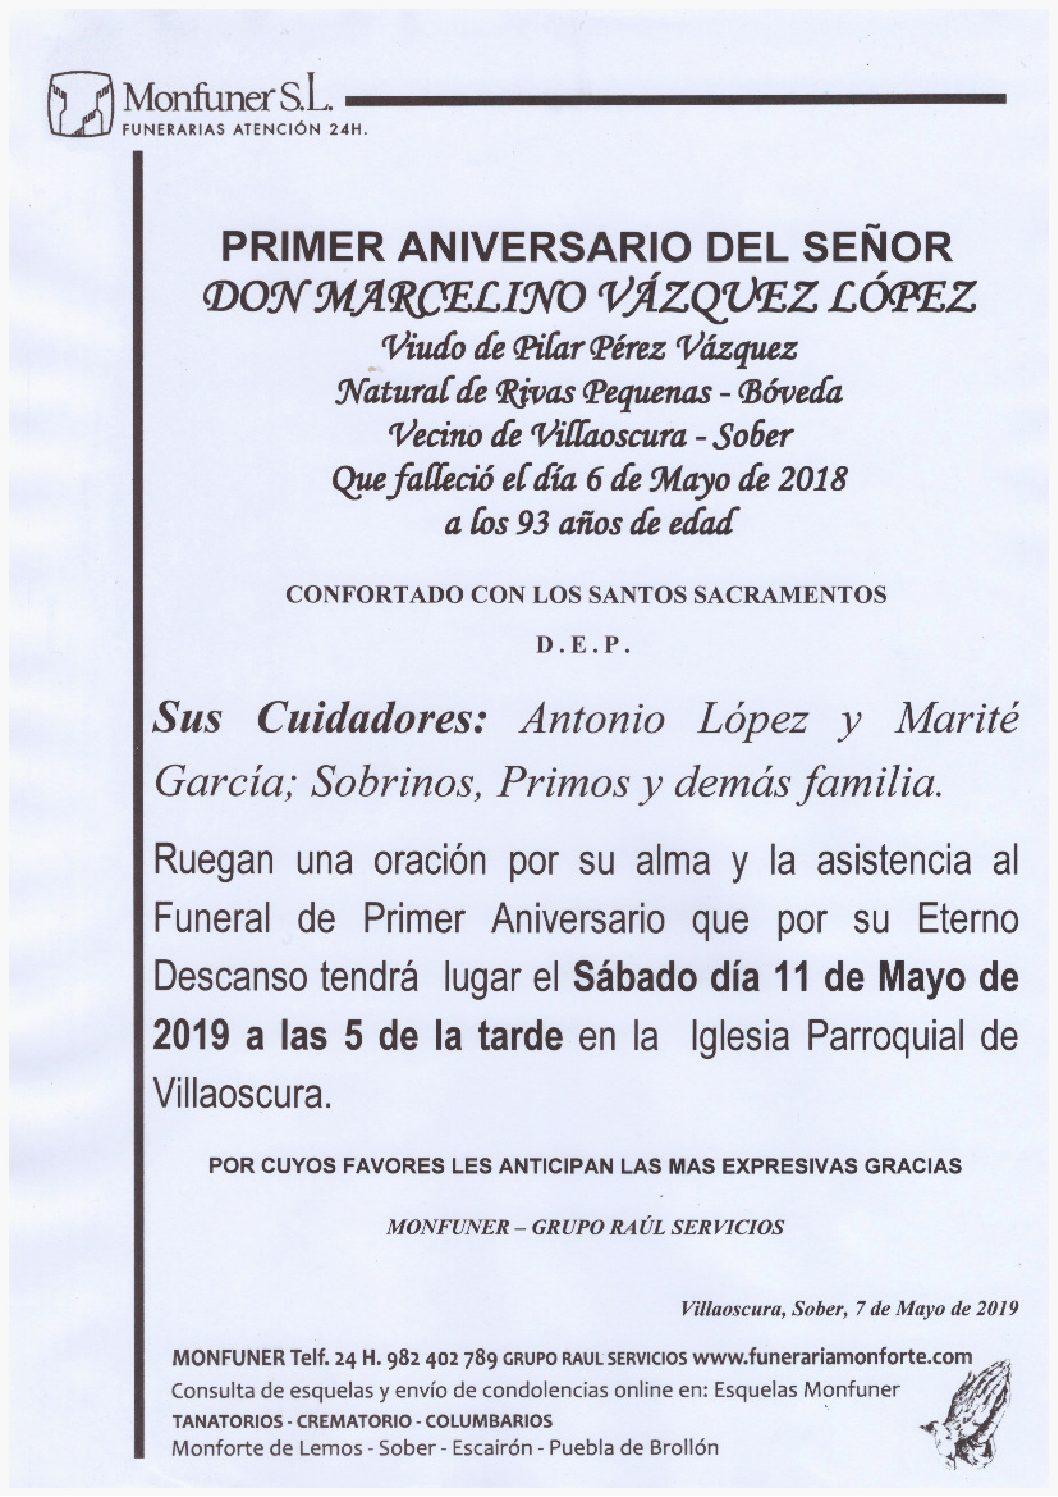 PRIMER ANIVERSARIO DE DON MARCELINO VAZQUEZ LOPEZ